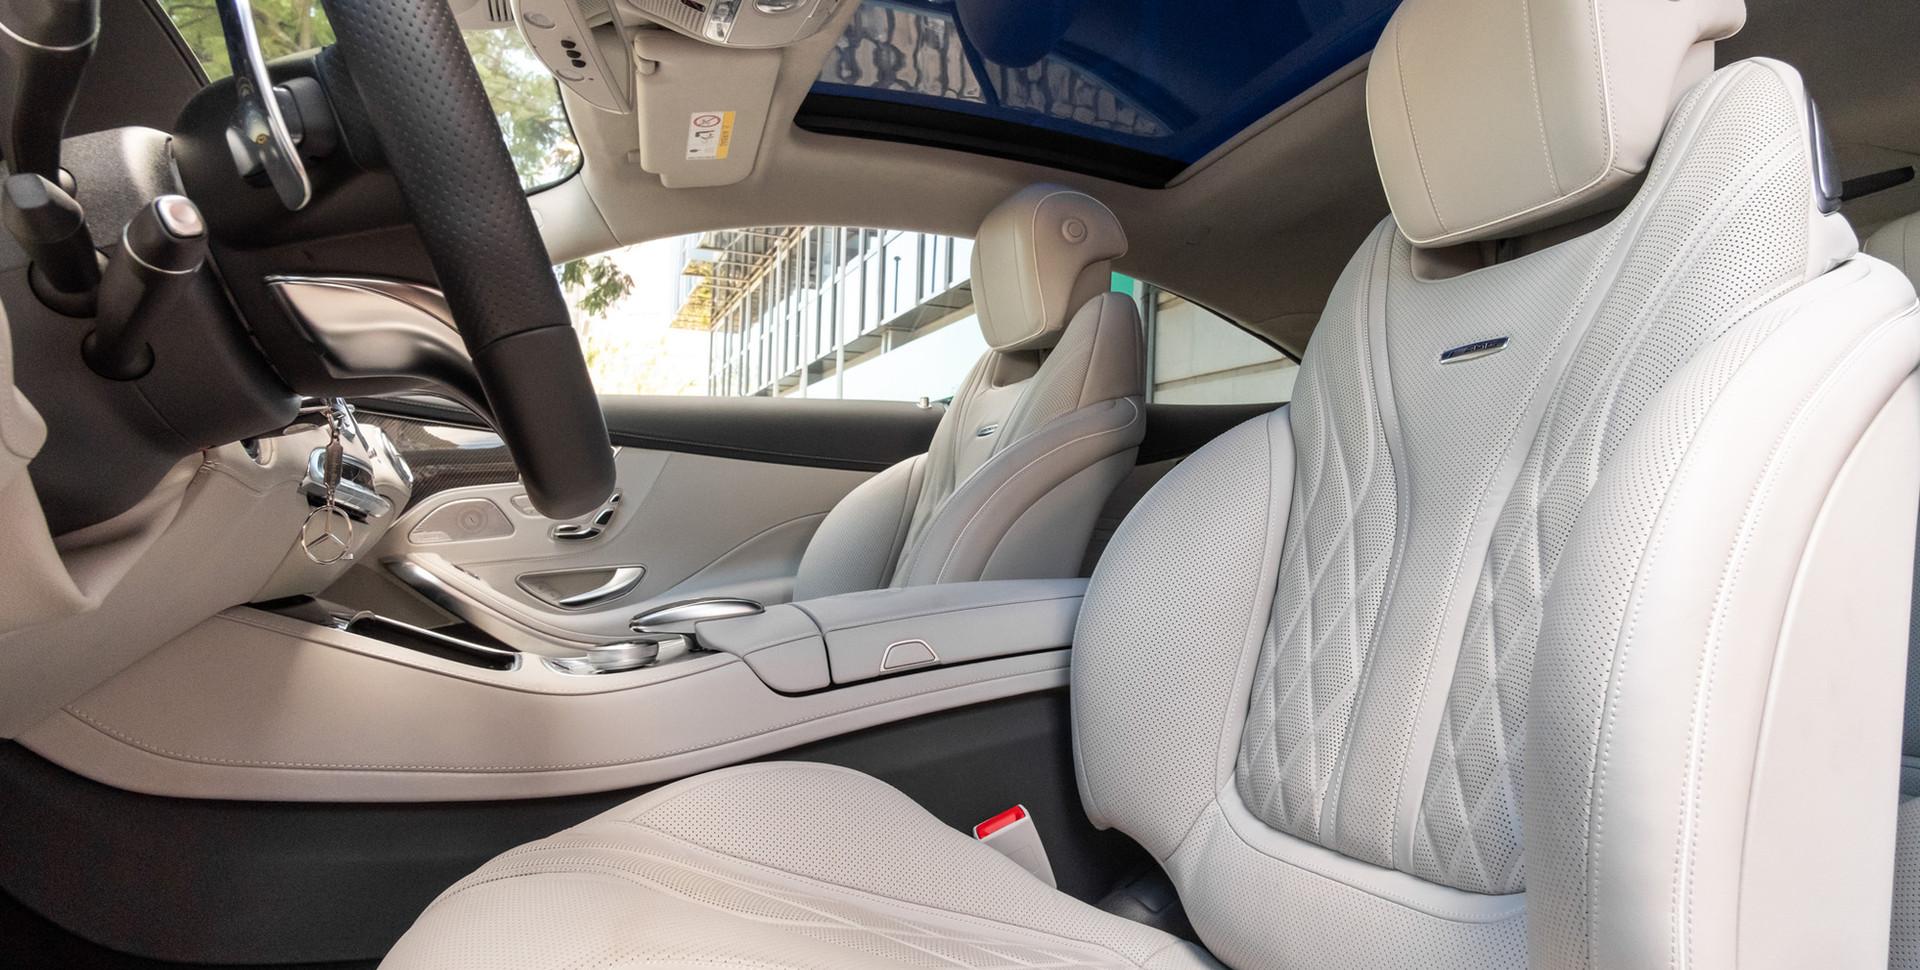 MB S63 AMG Coupe Azul-32.JPG